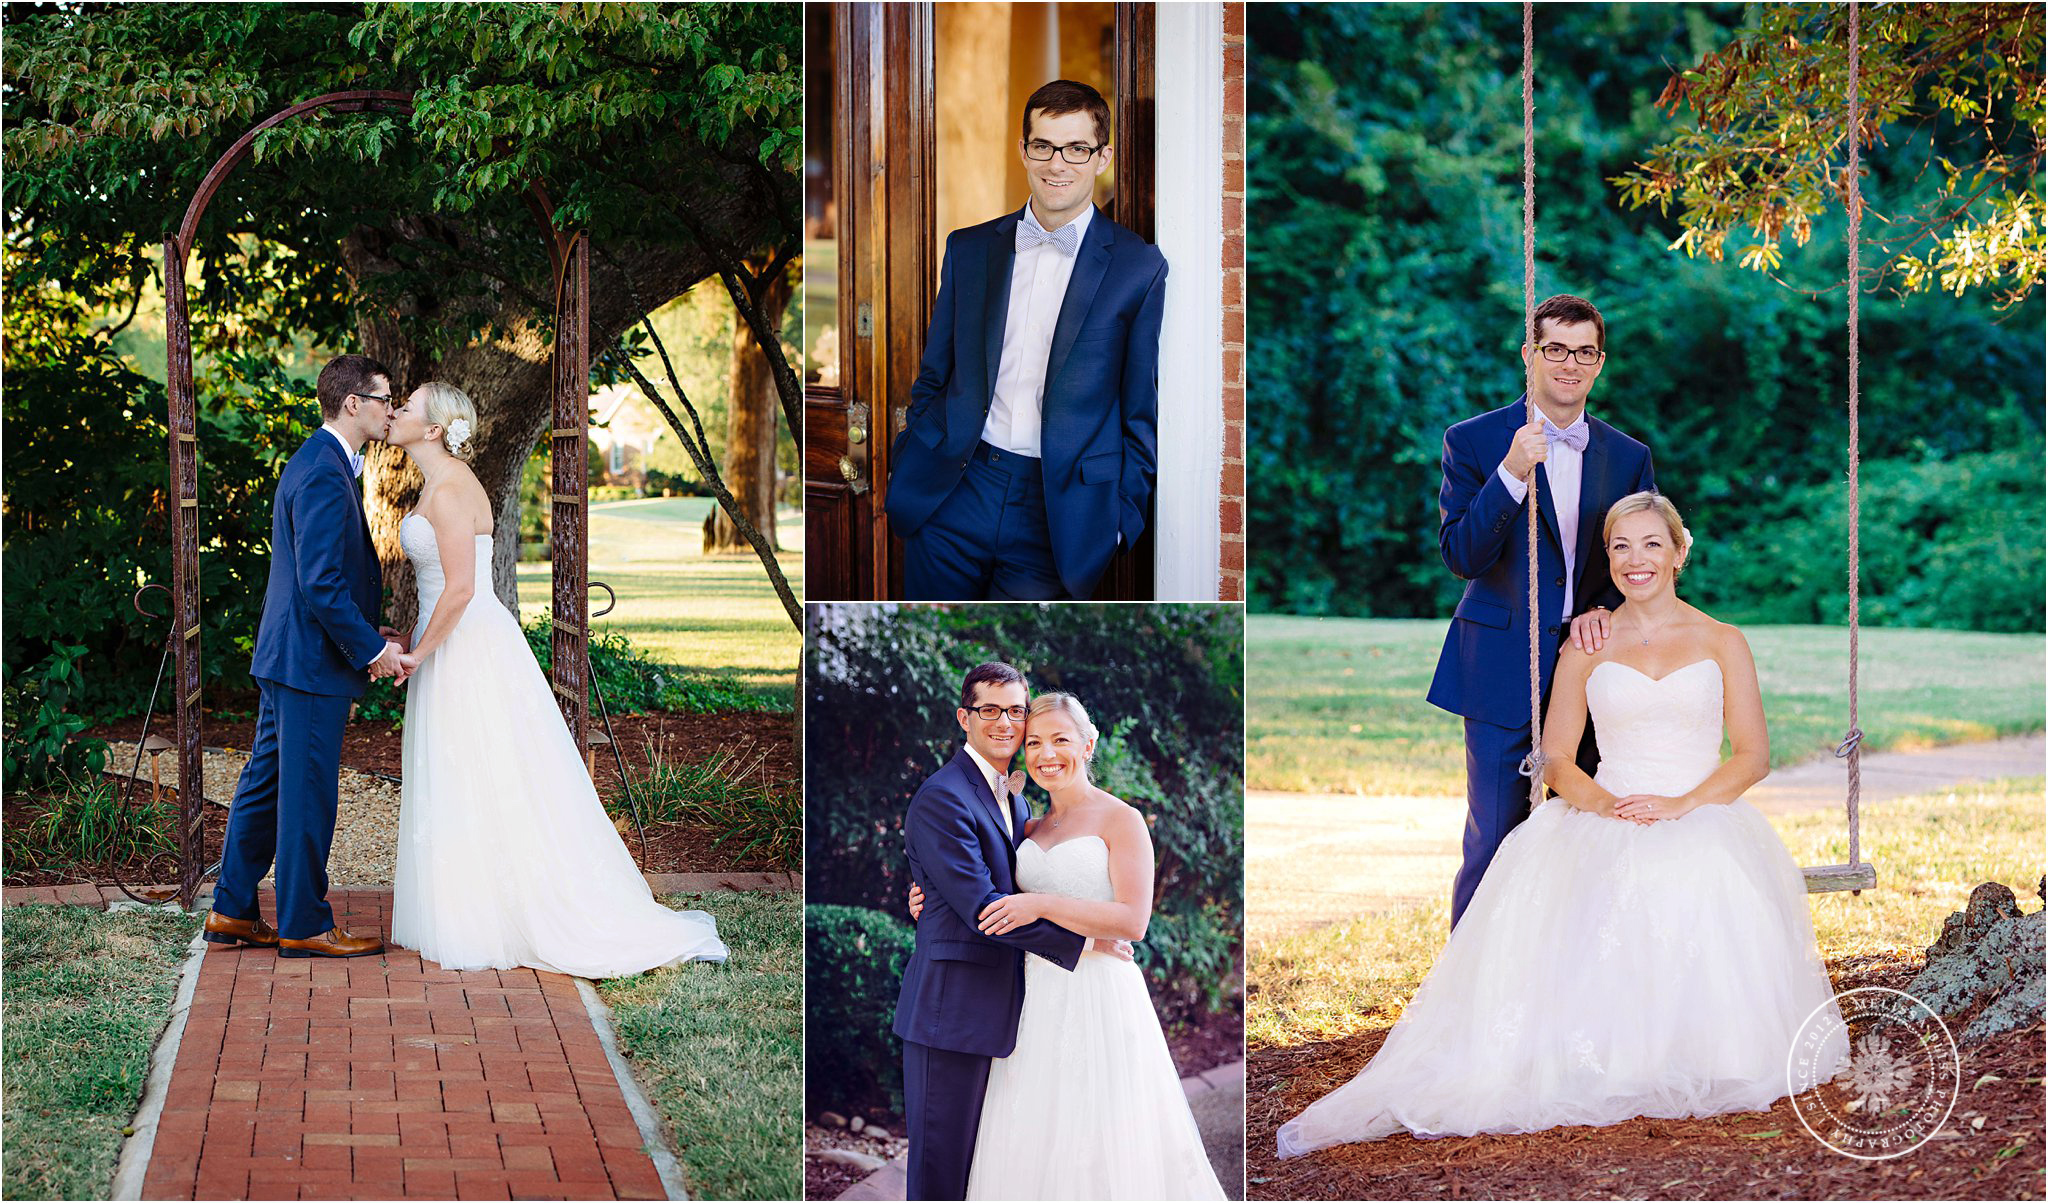 virginia-beach-professional-wedding-photographer-melissa-bliss-photography-church-point-manor-wedding-norfolk-portsmouth-williamsburg-wedding-photographers